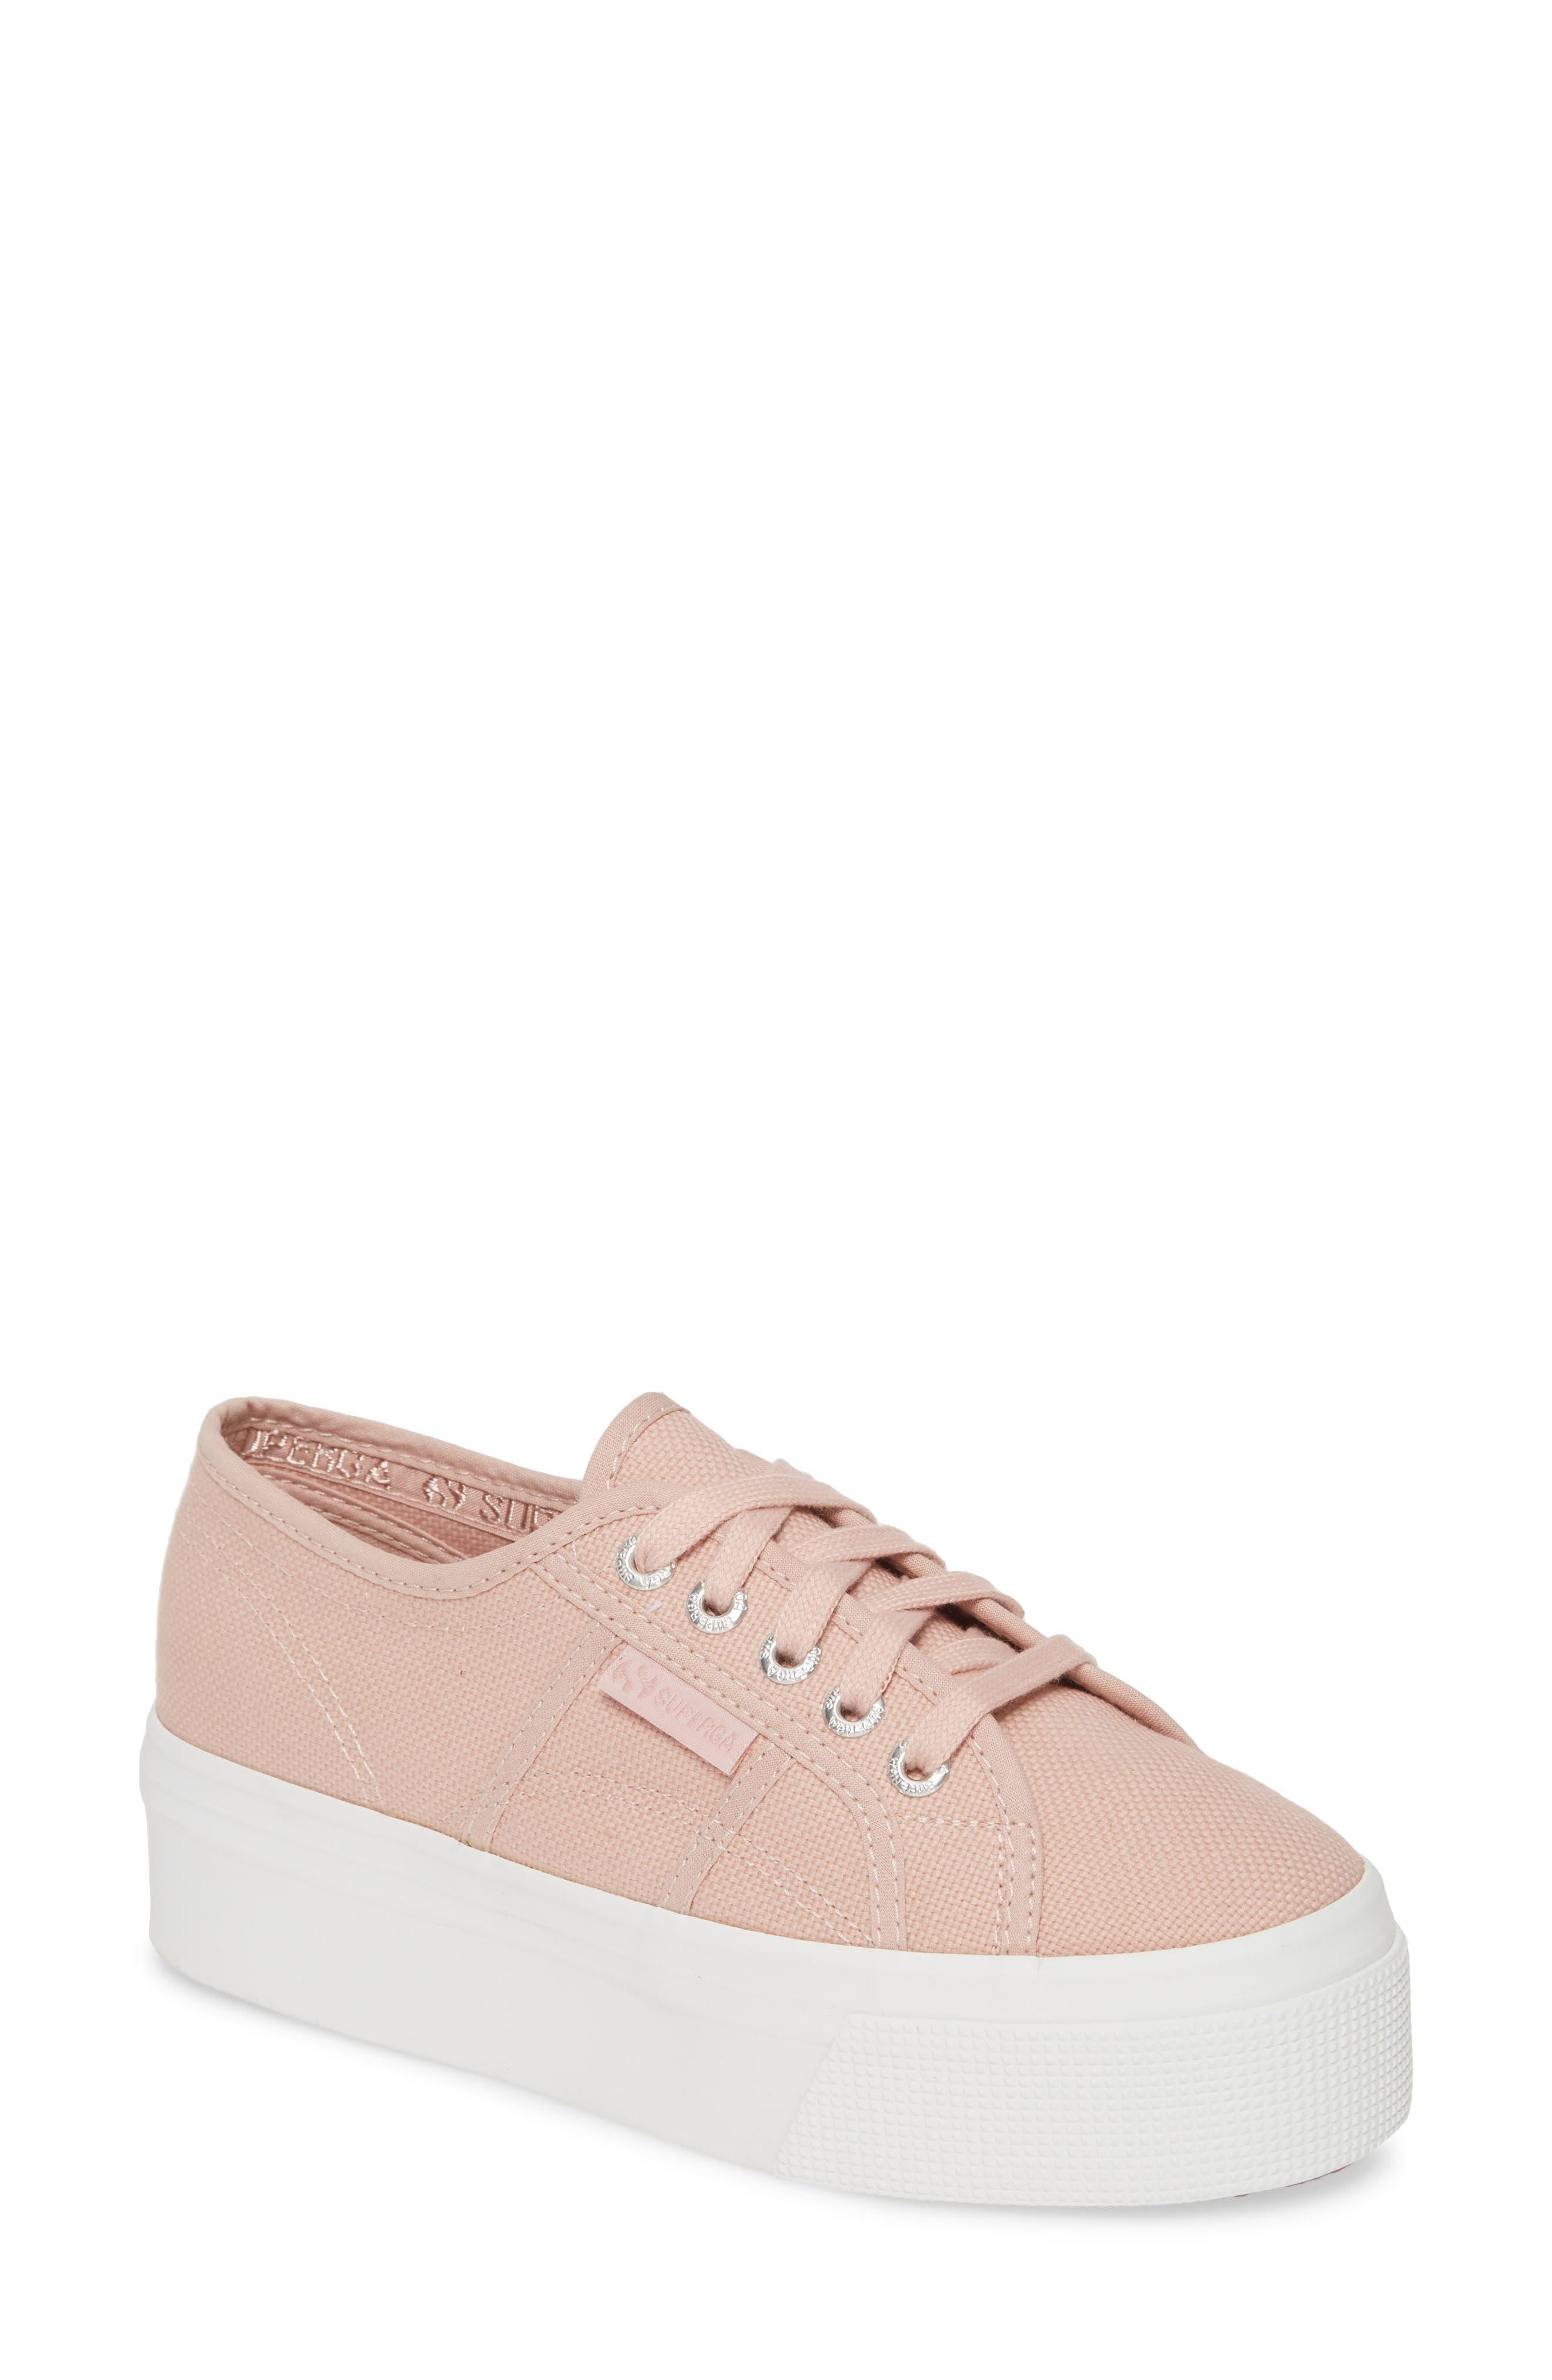 9026219b3 Women's Platform Sneakers & Running Shoes | Nordstrom